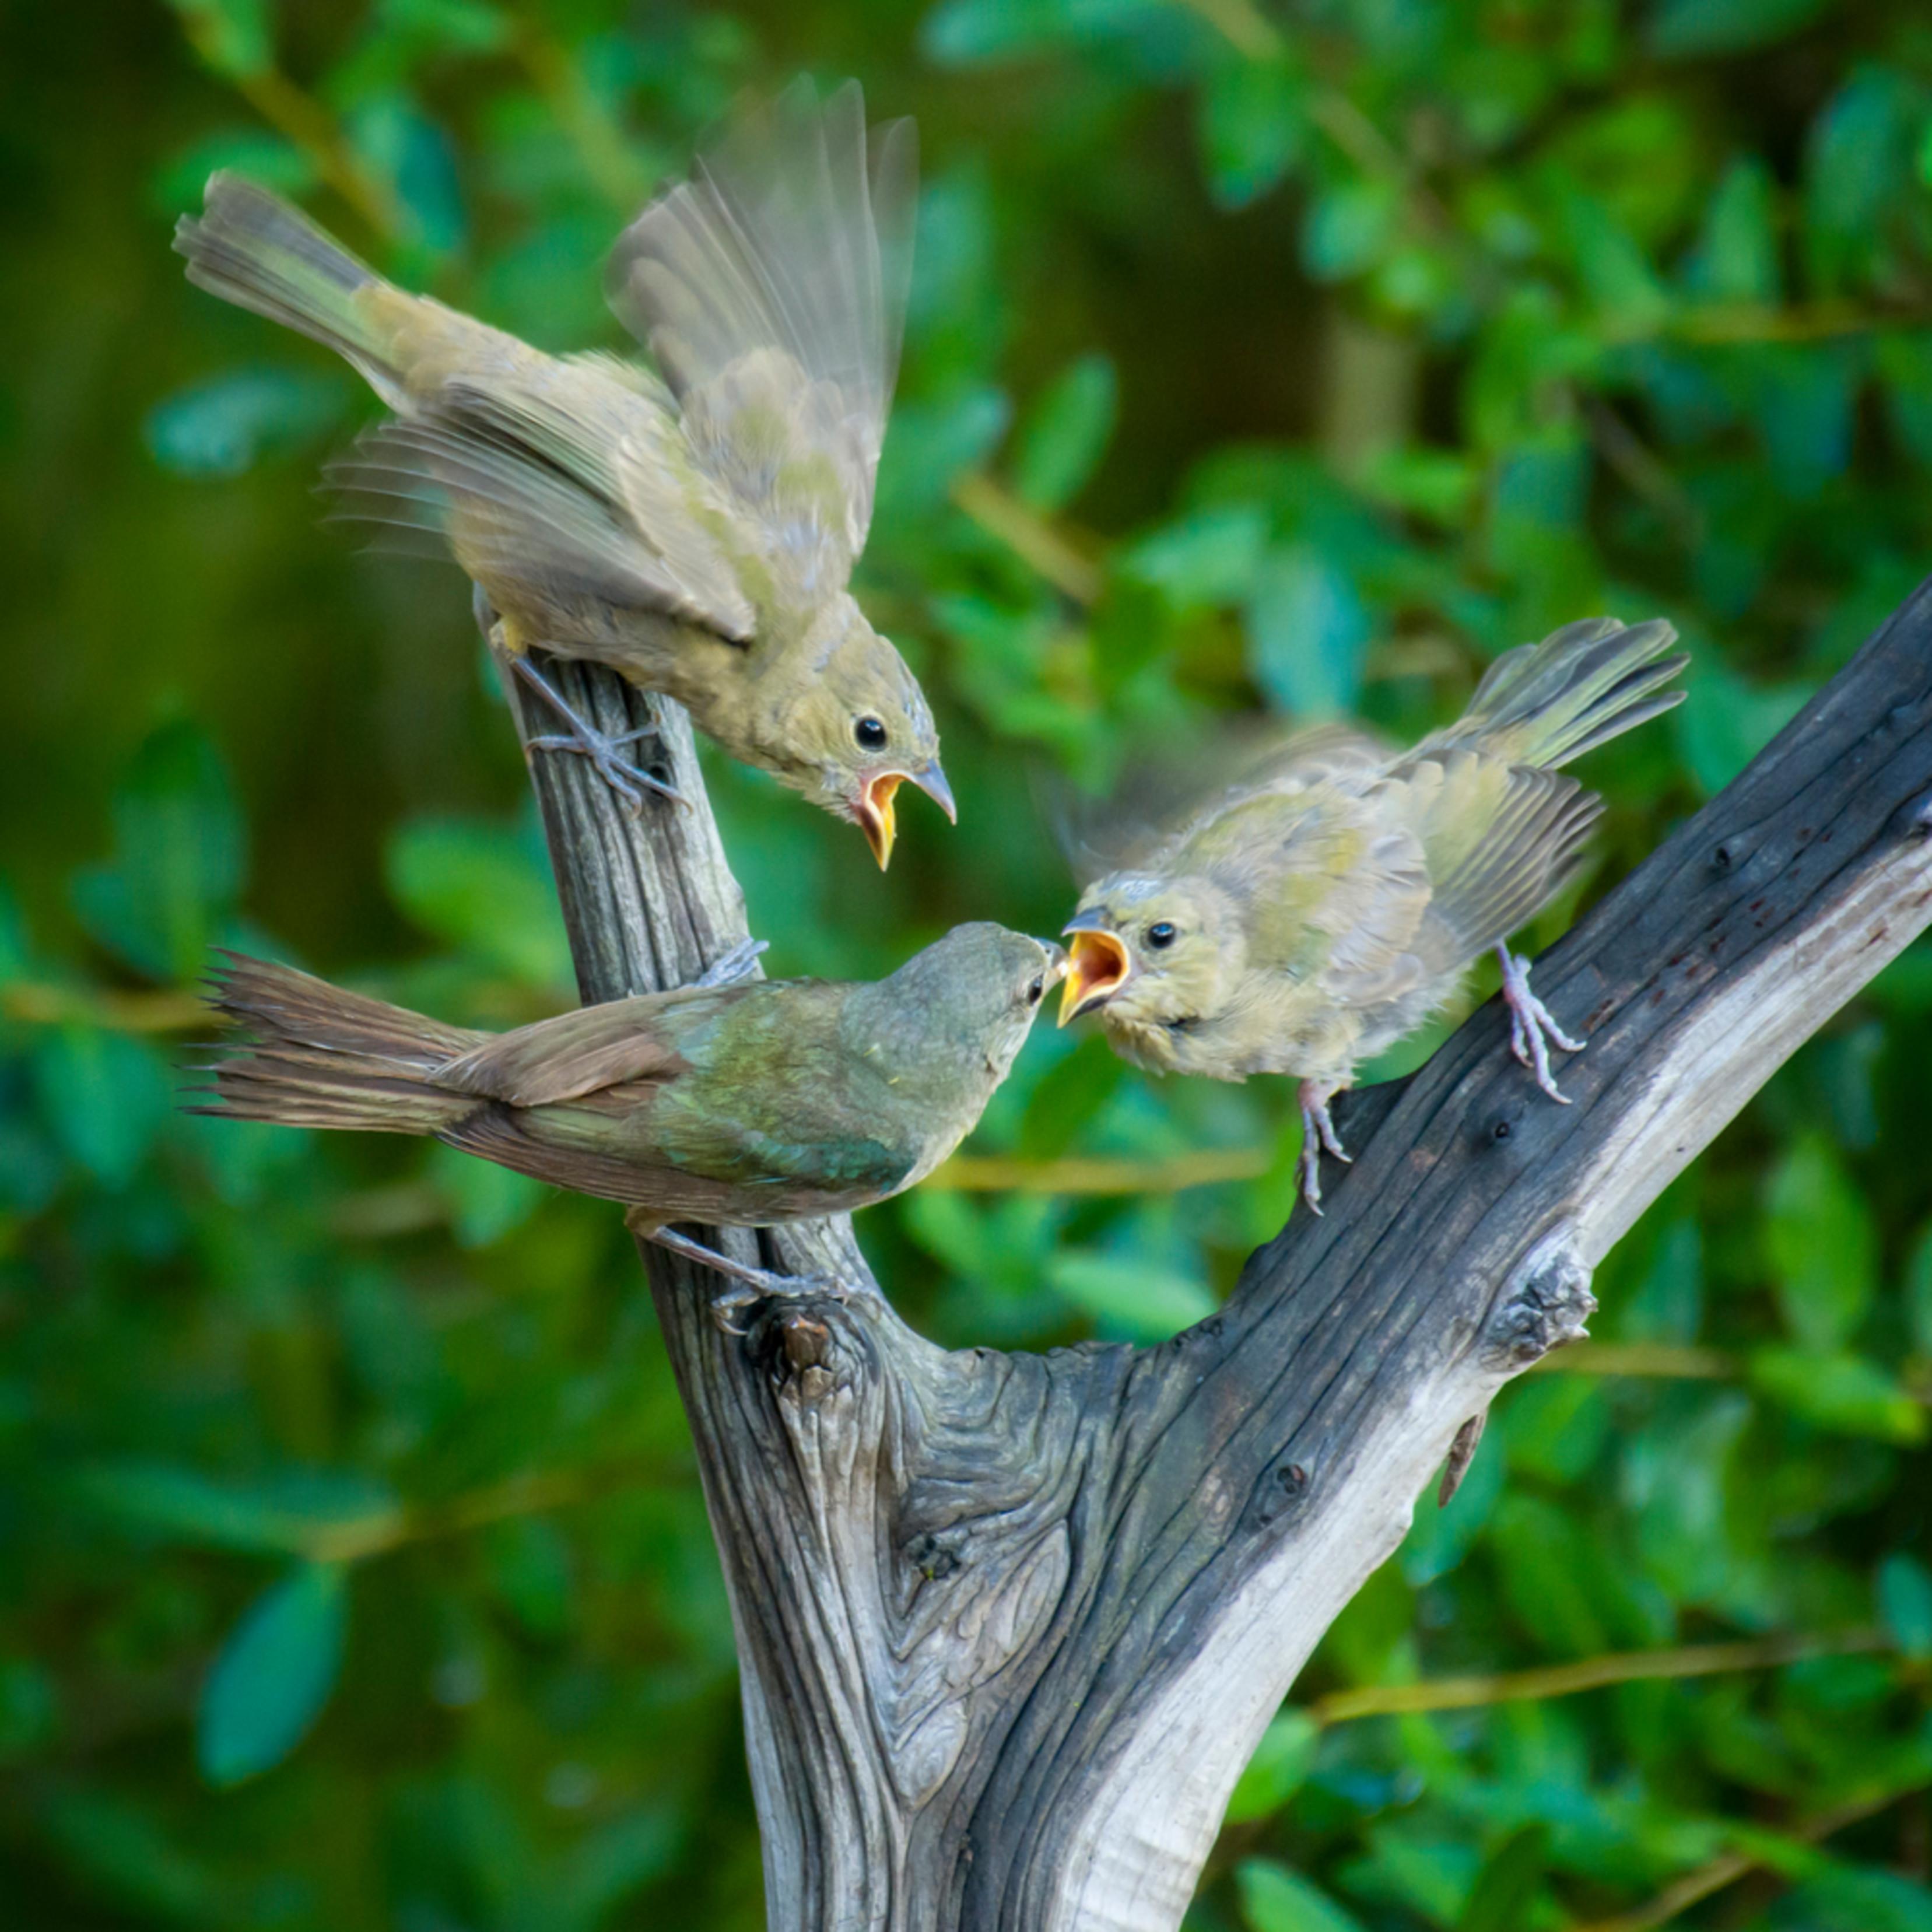 Backyard birds   aug2019  2 20190828 3233 i1yti9